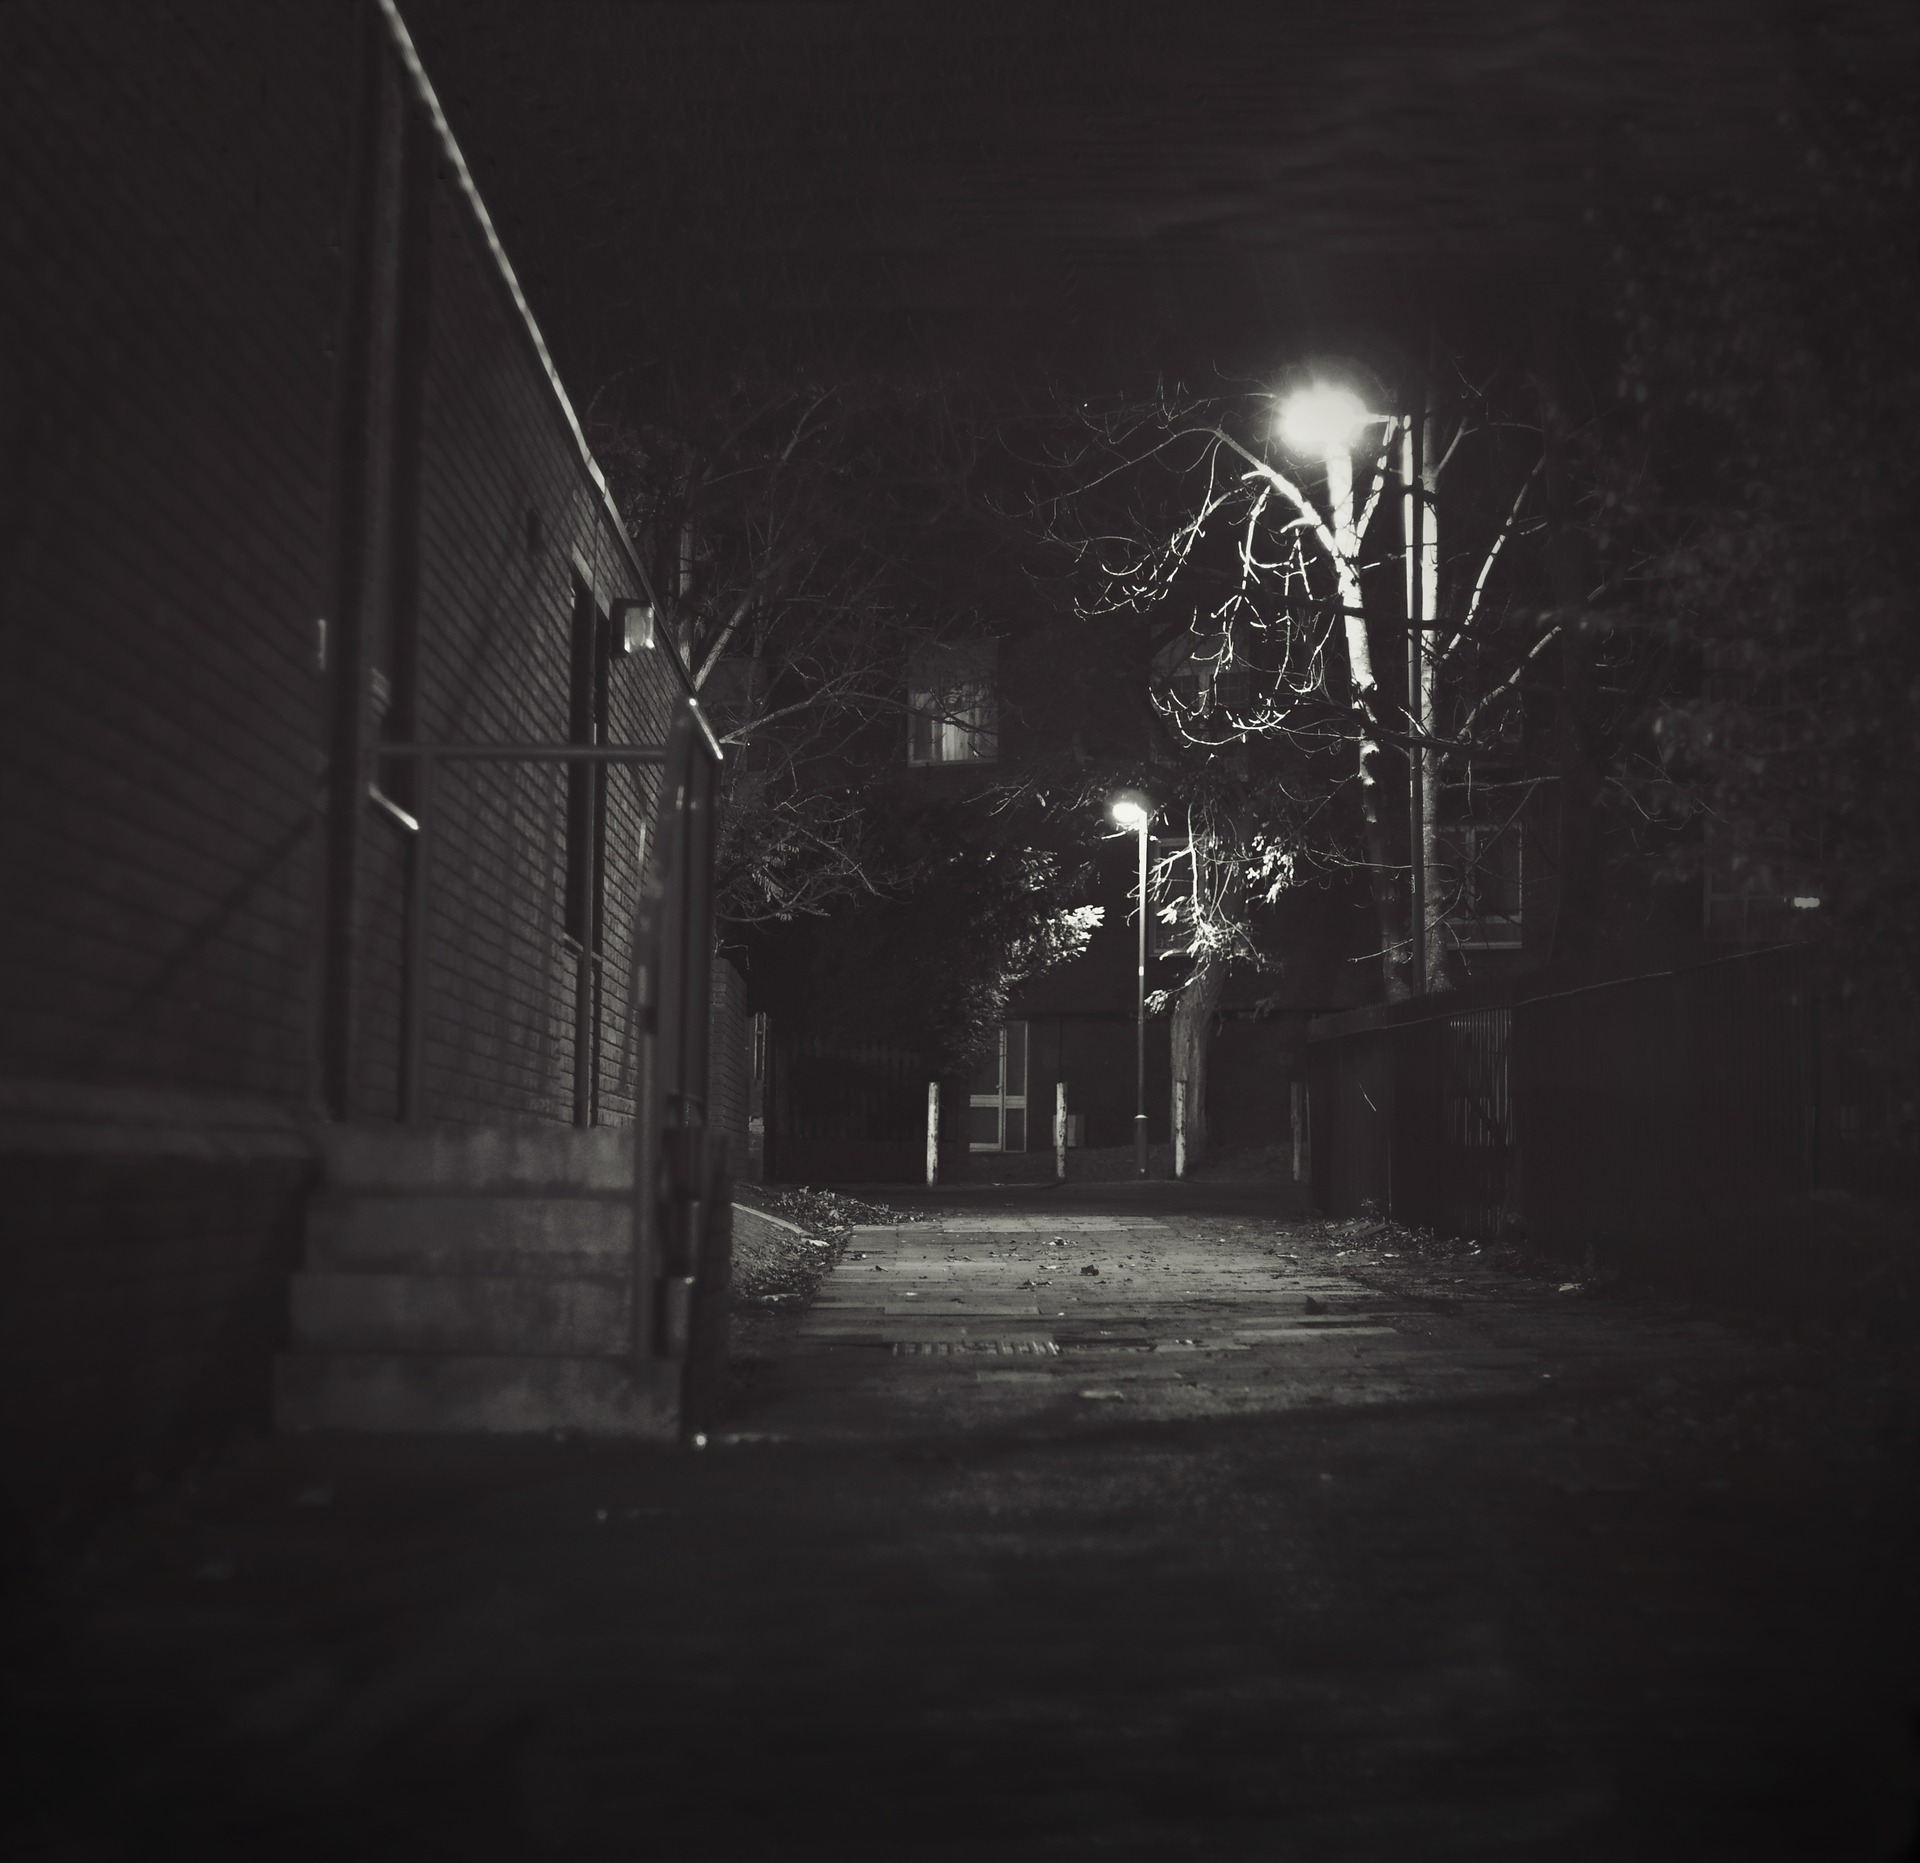 night-434244_1920 (2).jpg